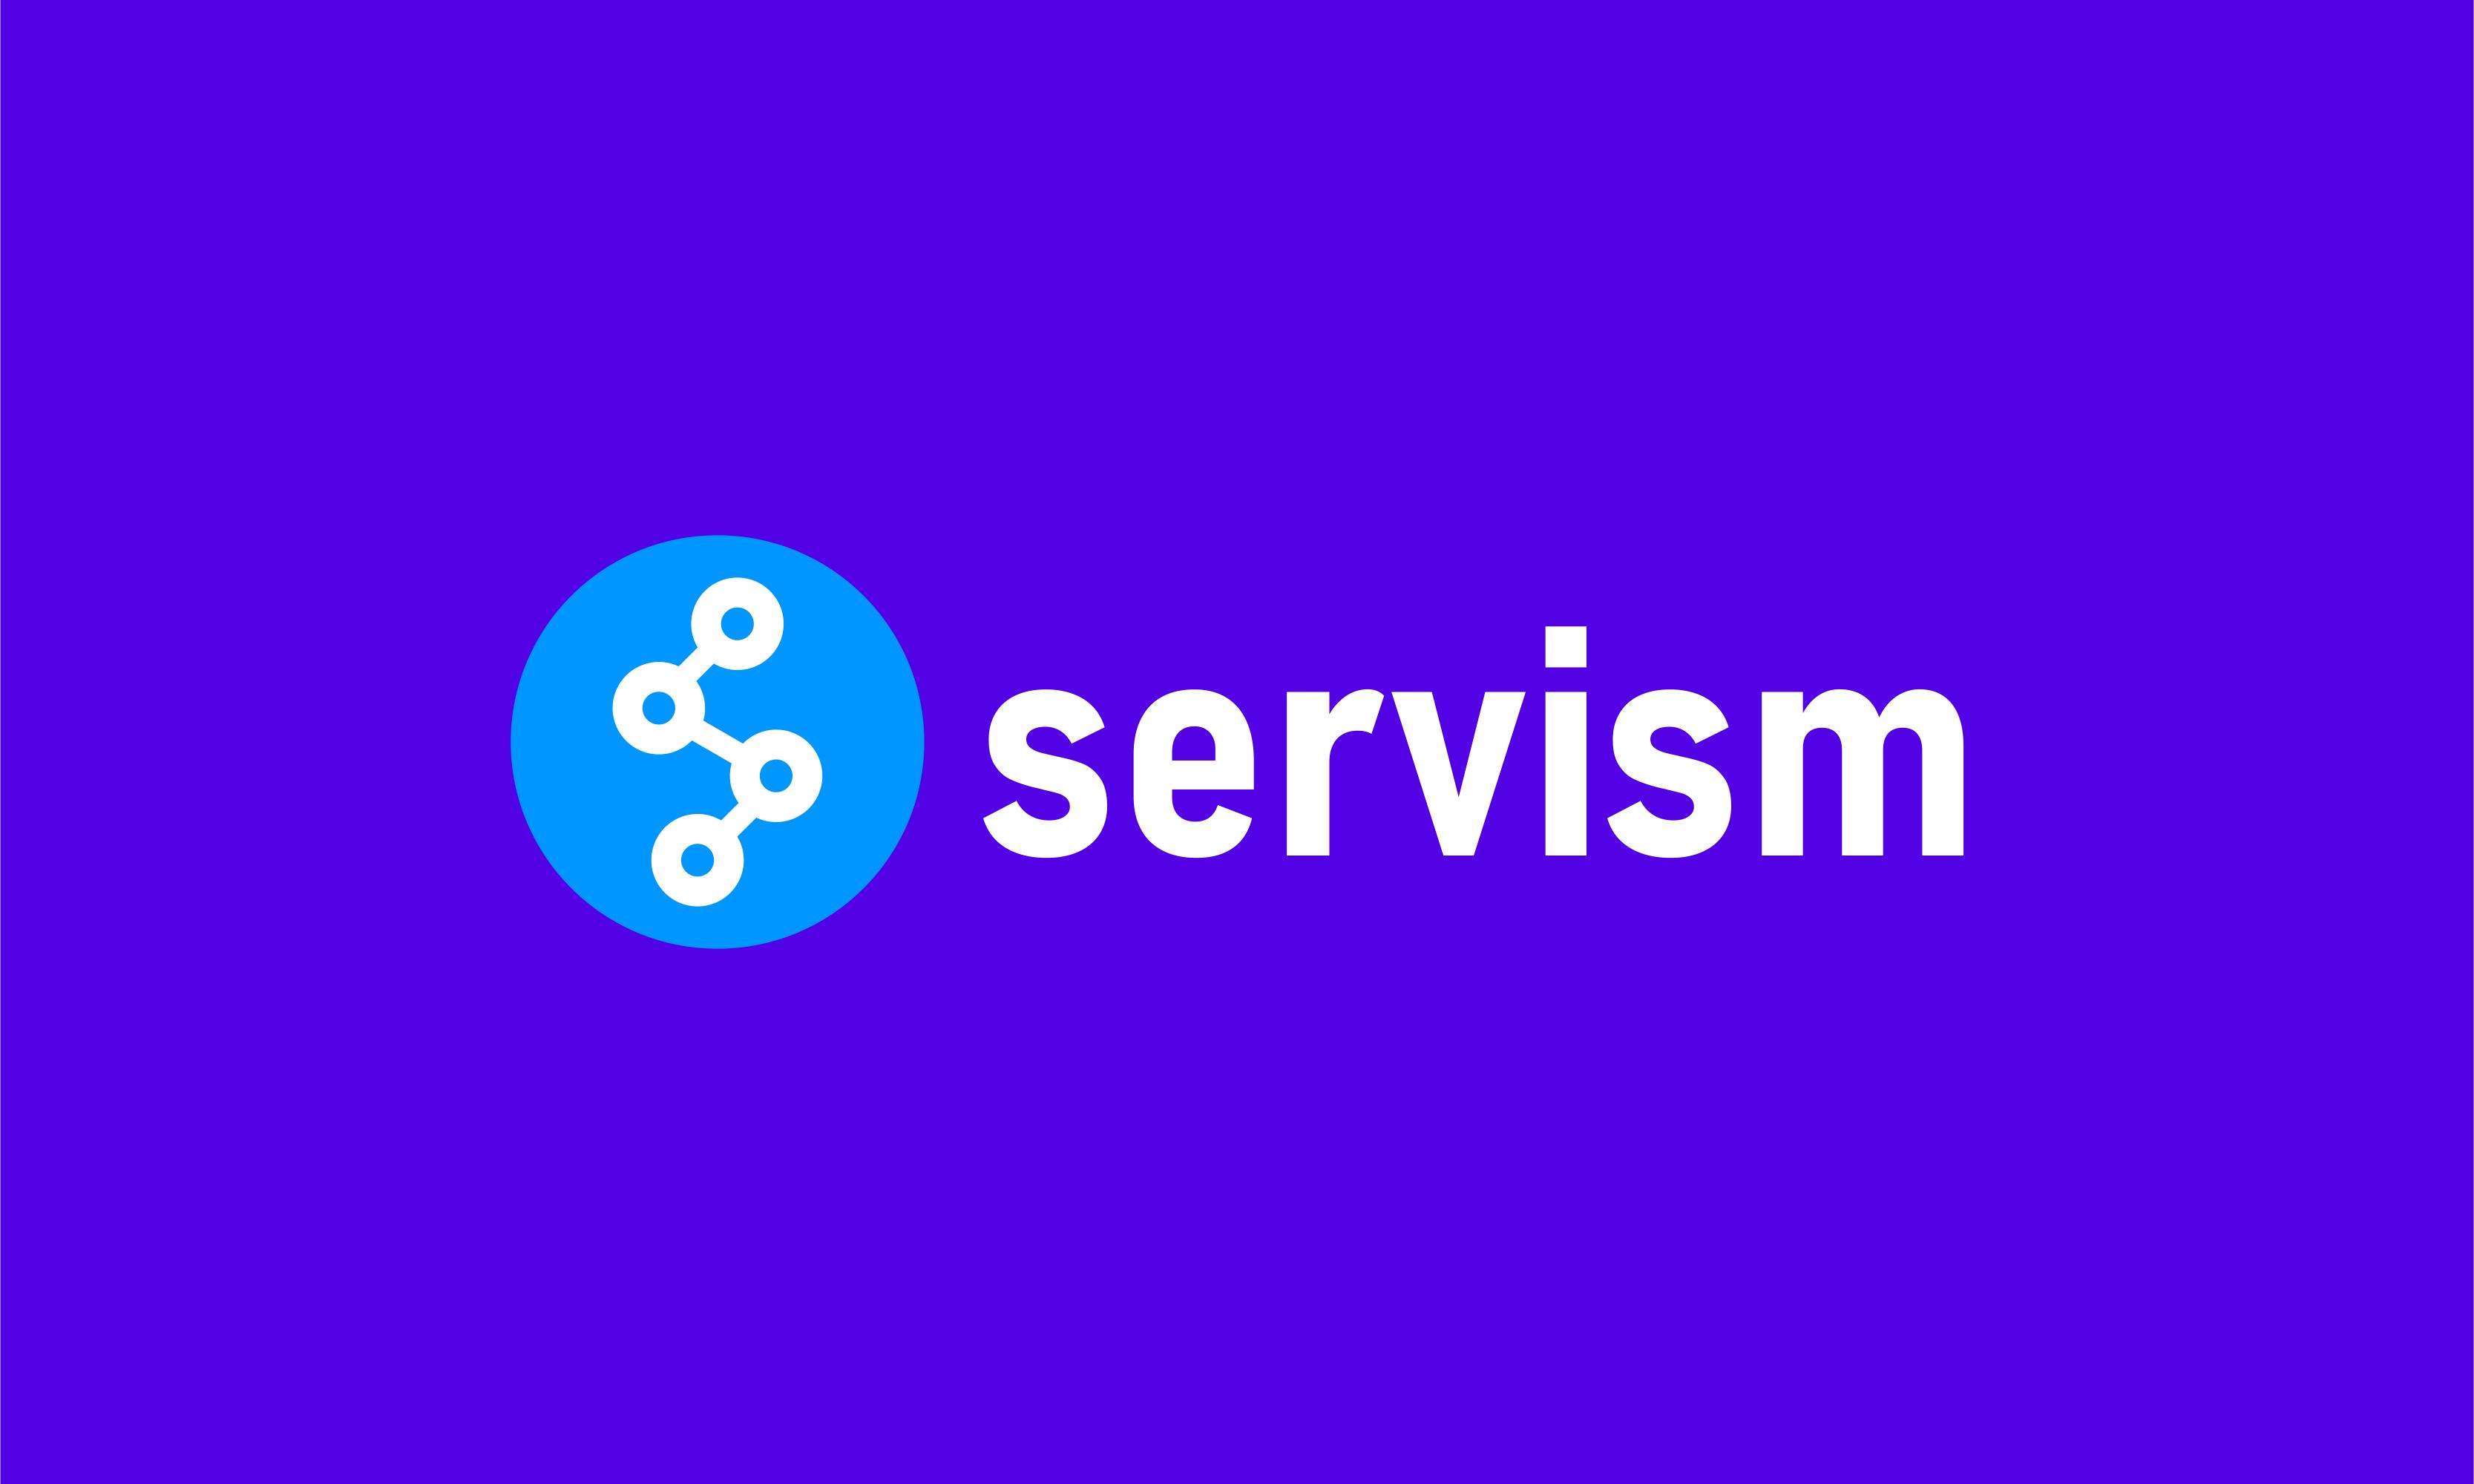 Servism